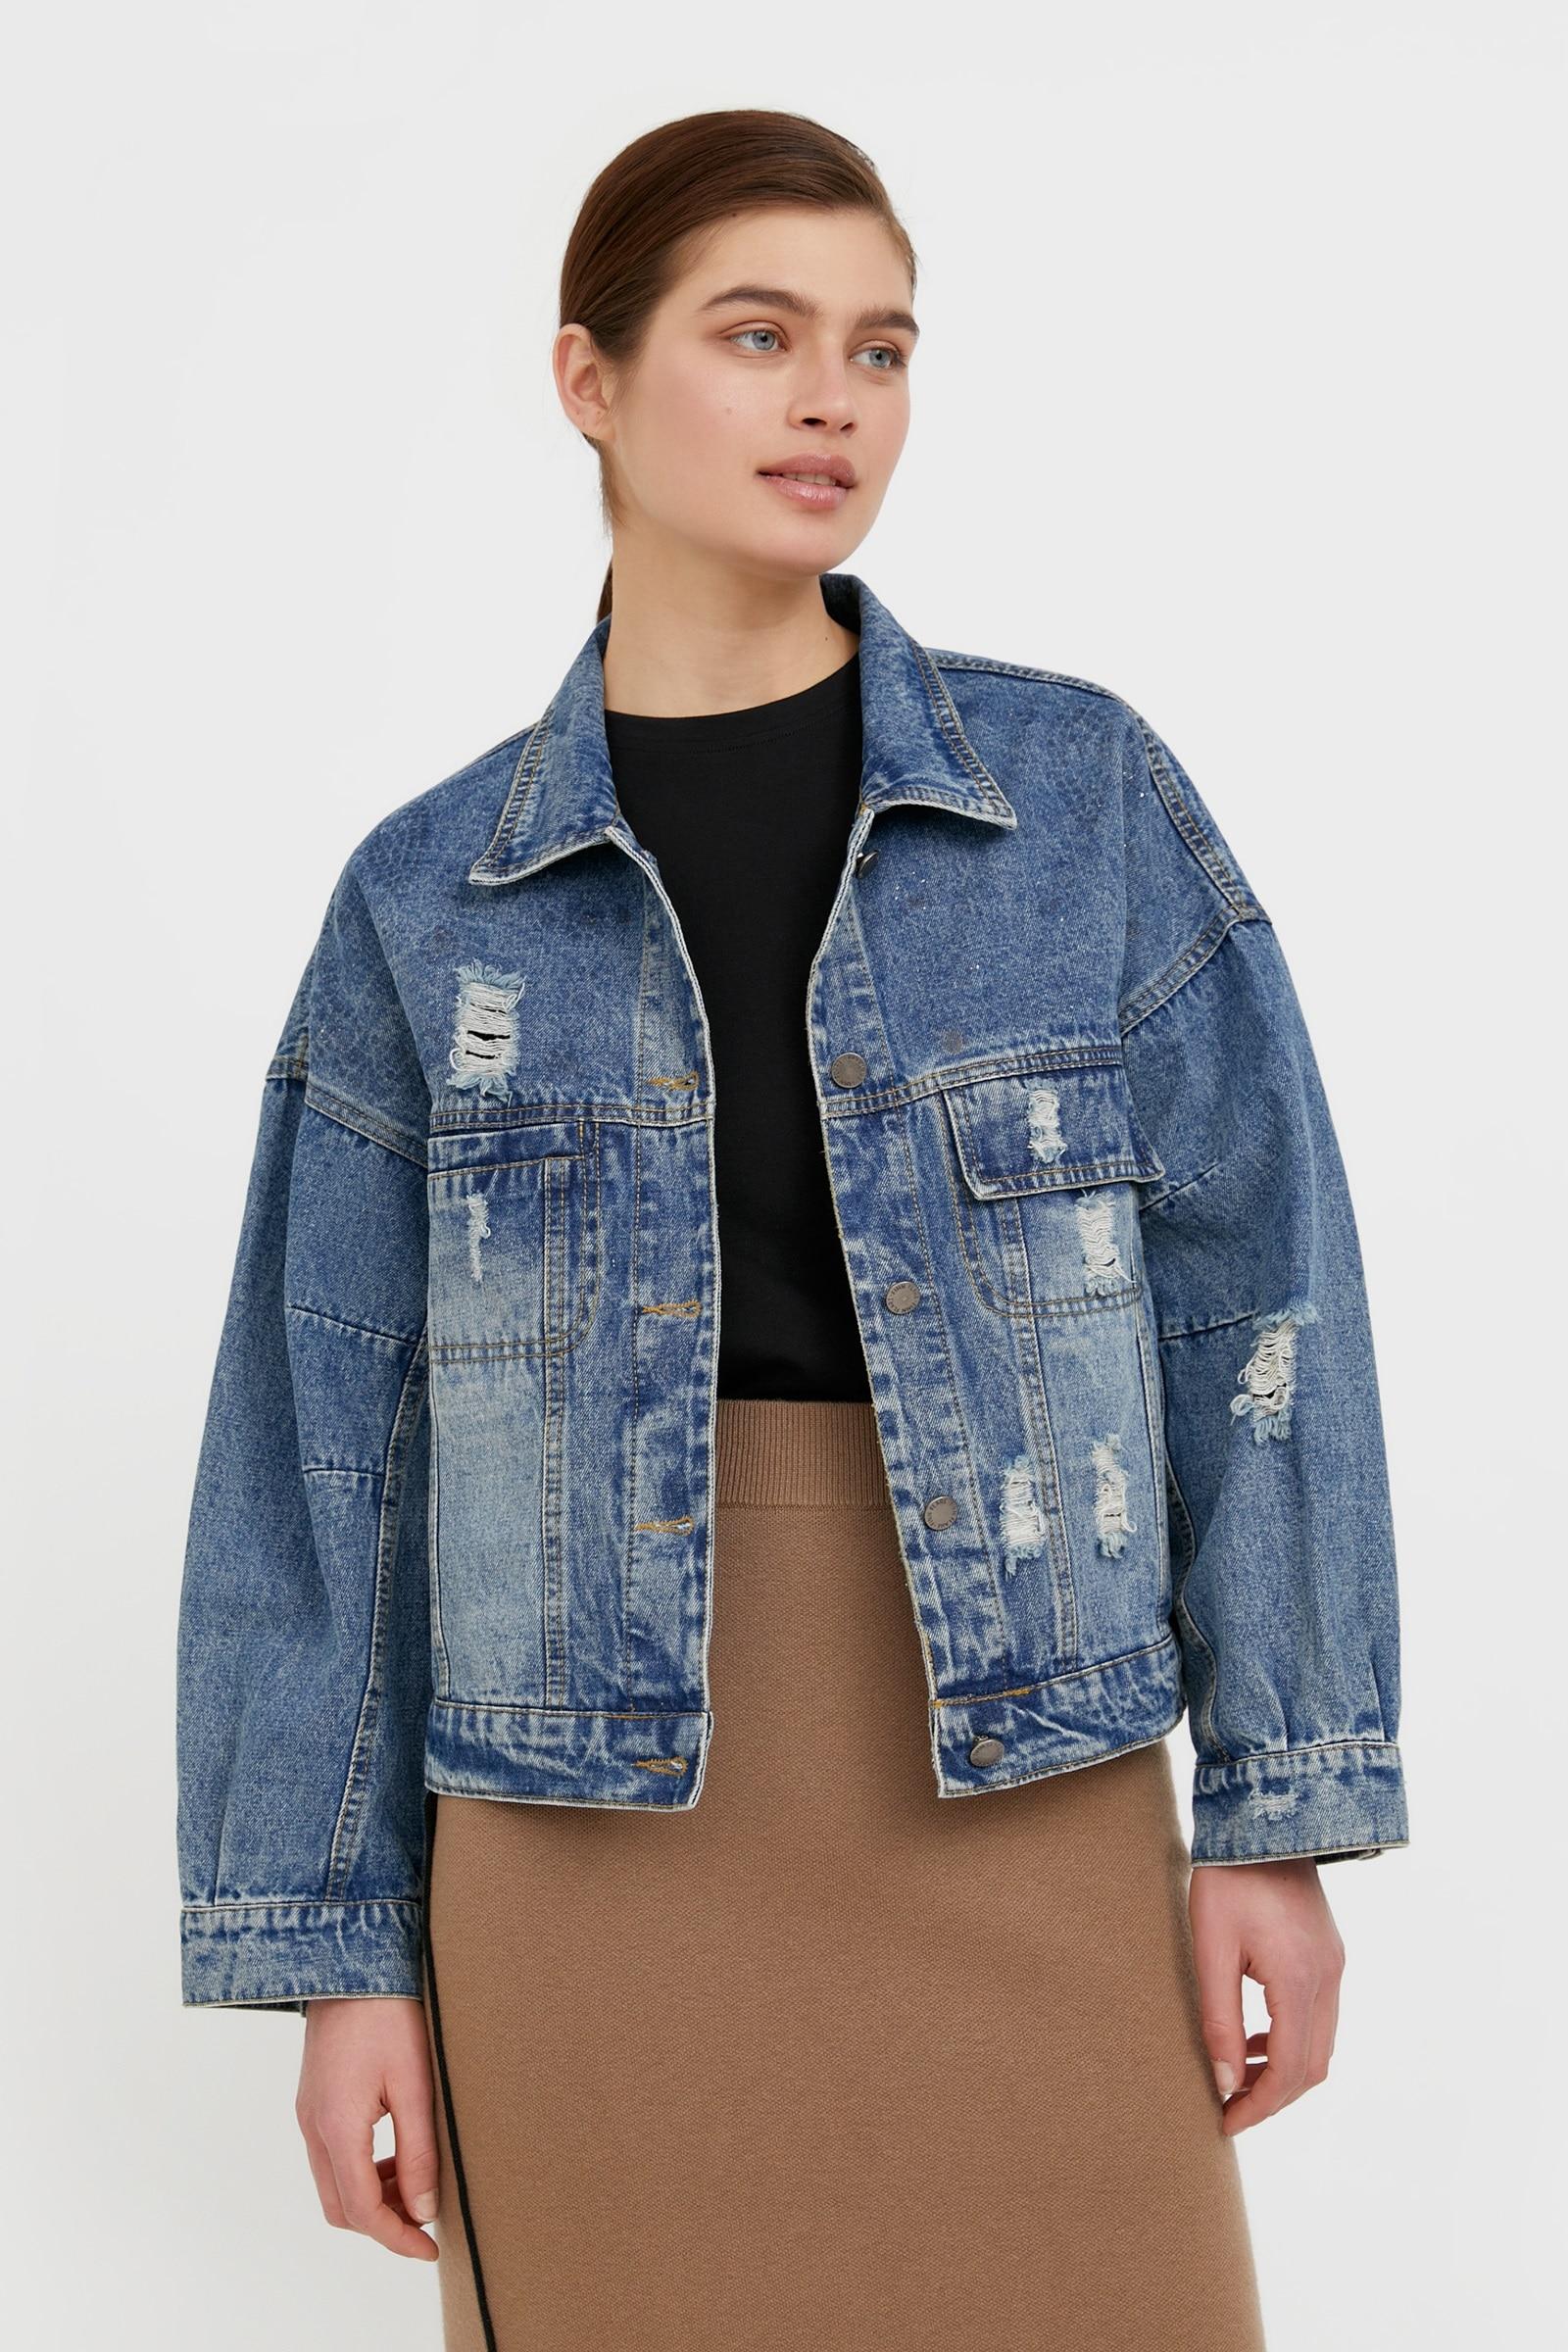 finn flare -  Jeansjacke, mit stylischen Used-Elementen